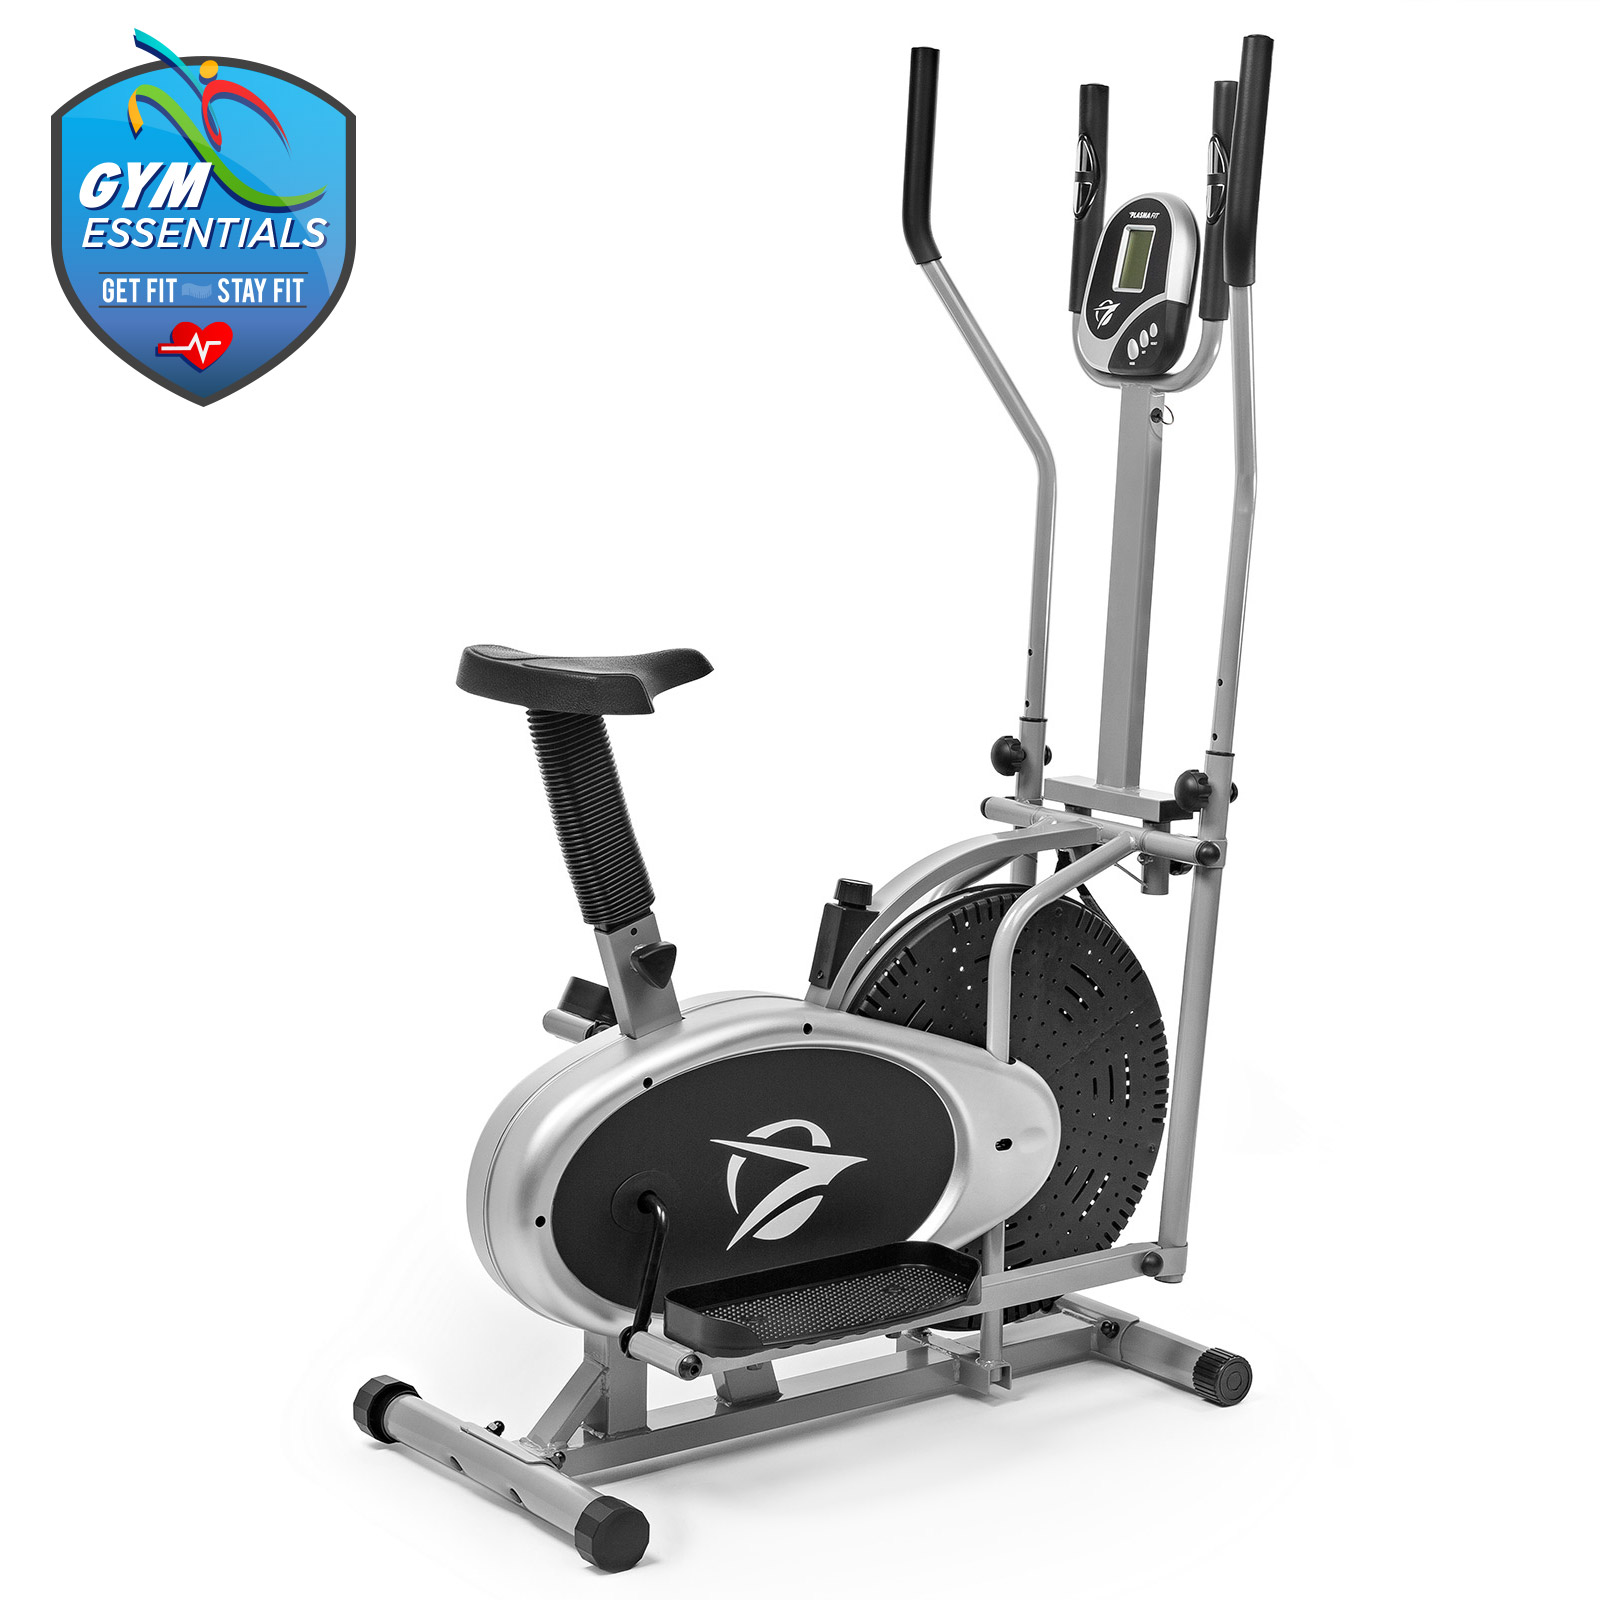 Elliptical machine trainer in exercise bike total